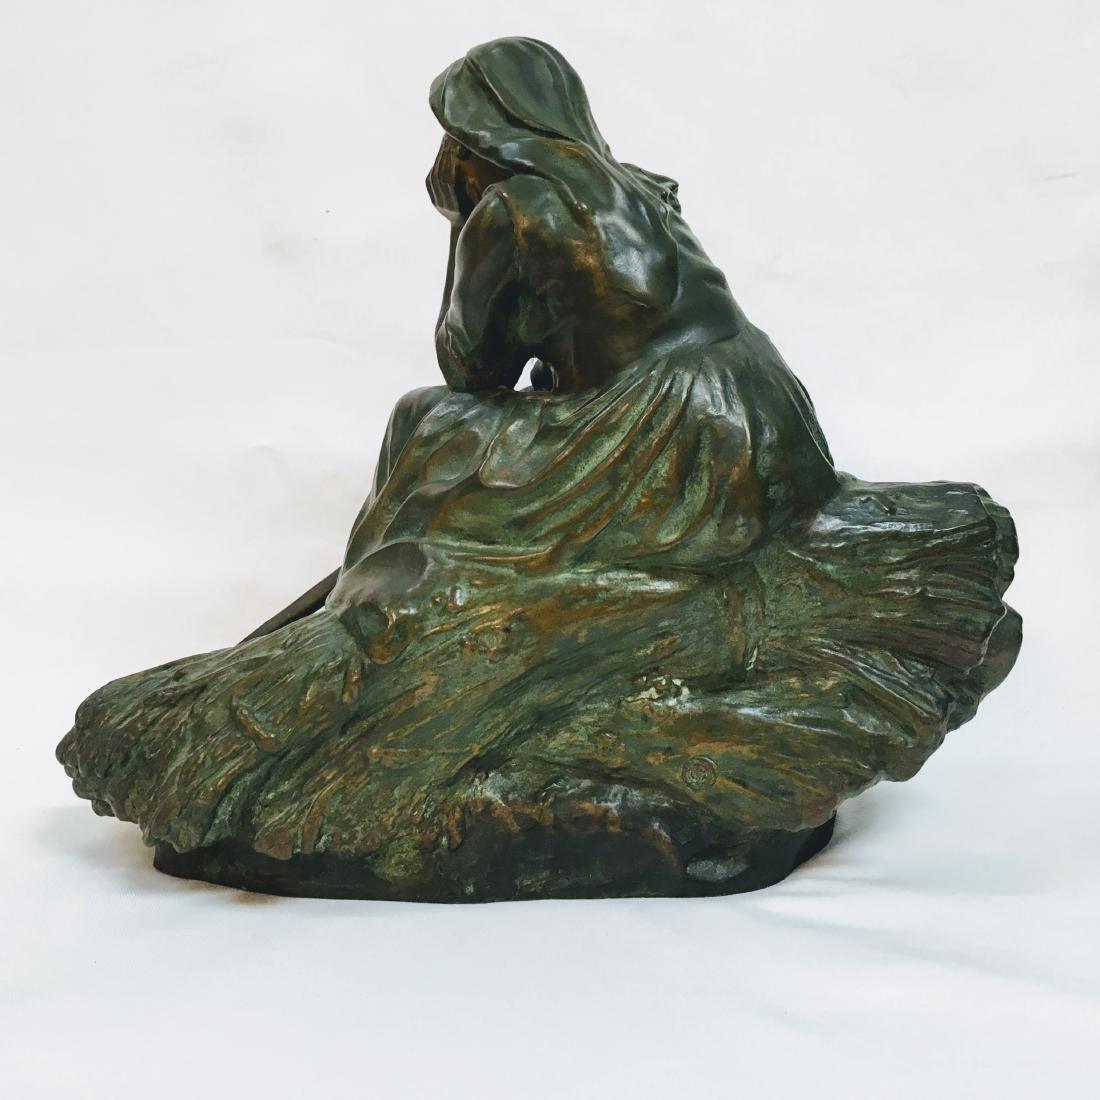 CORNEILLE HENRI THEUNISSEN 1863-1918 REVERIE AU CHAMP - 3